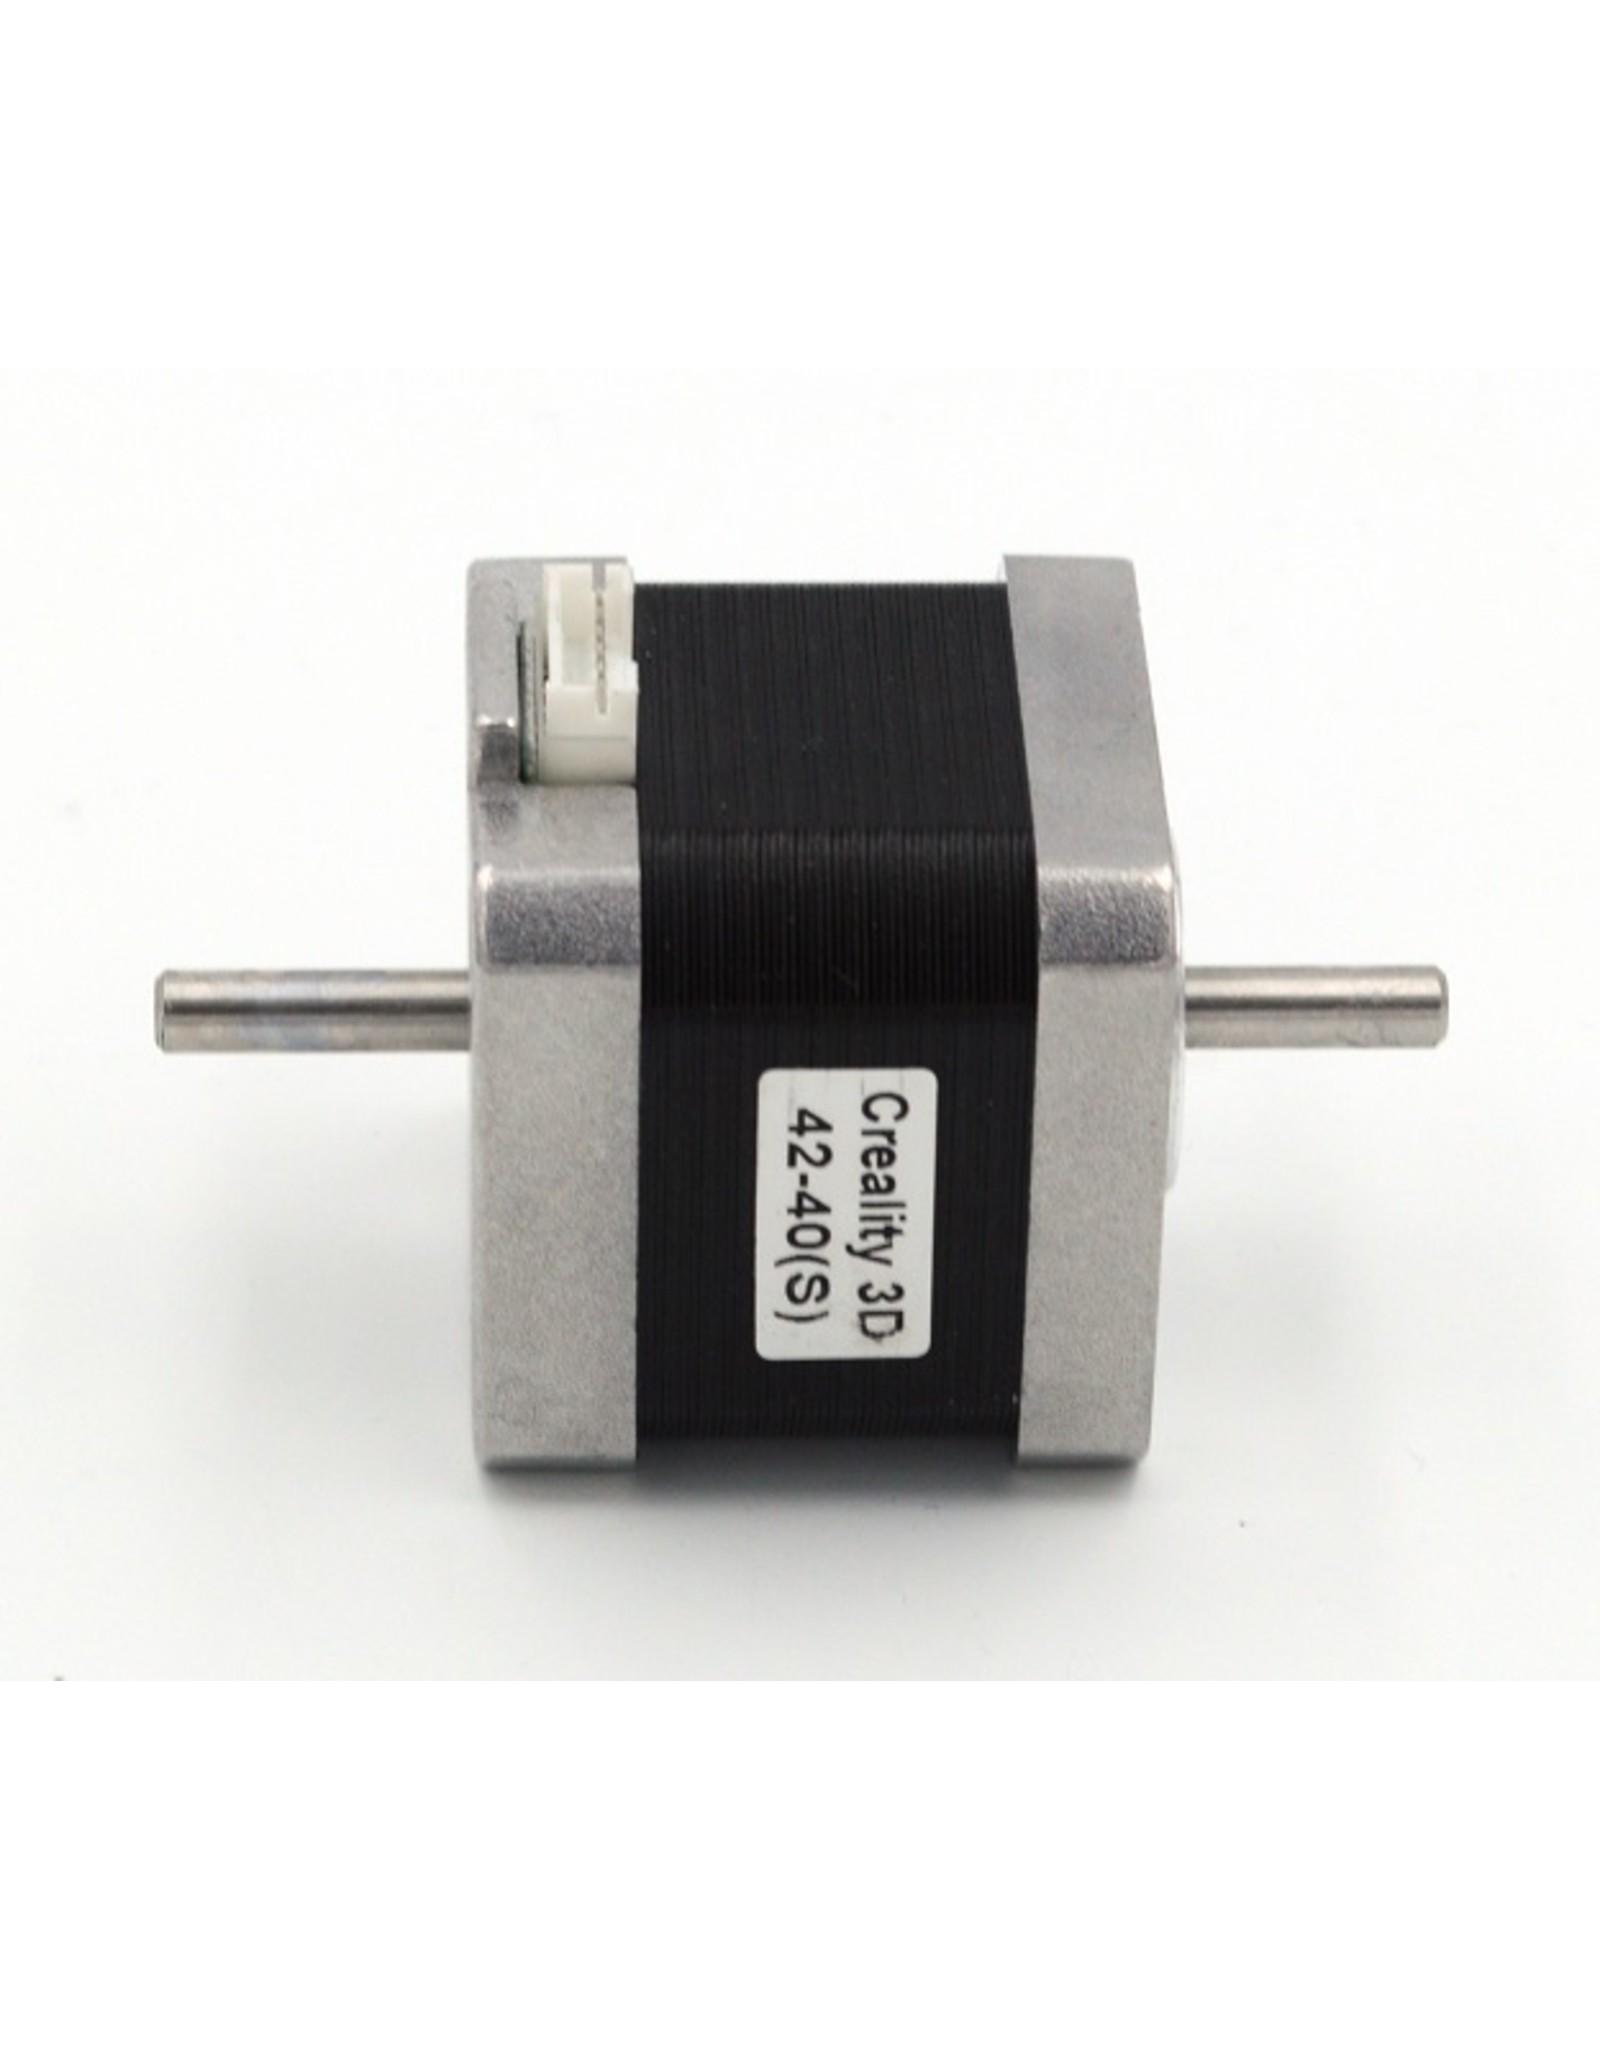 Creality/Ender Creality 3D 42-40 stappenmotor met dubbele as